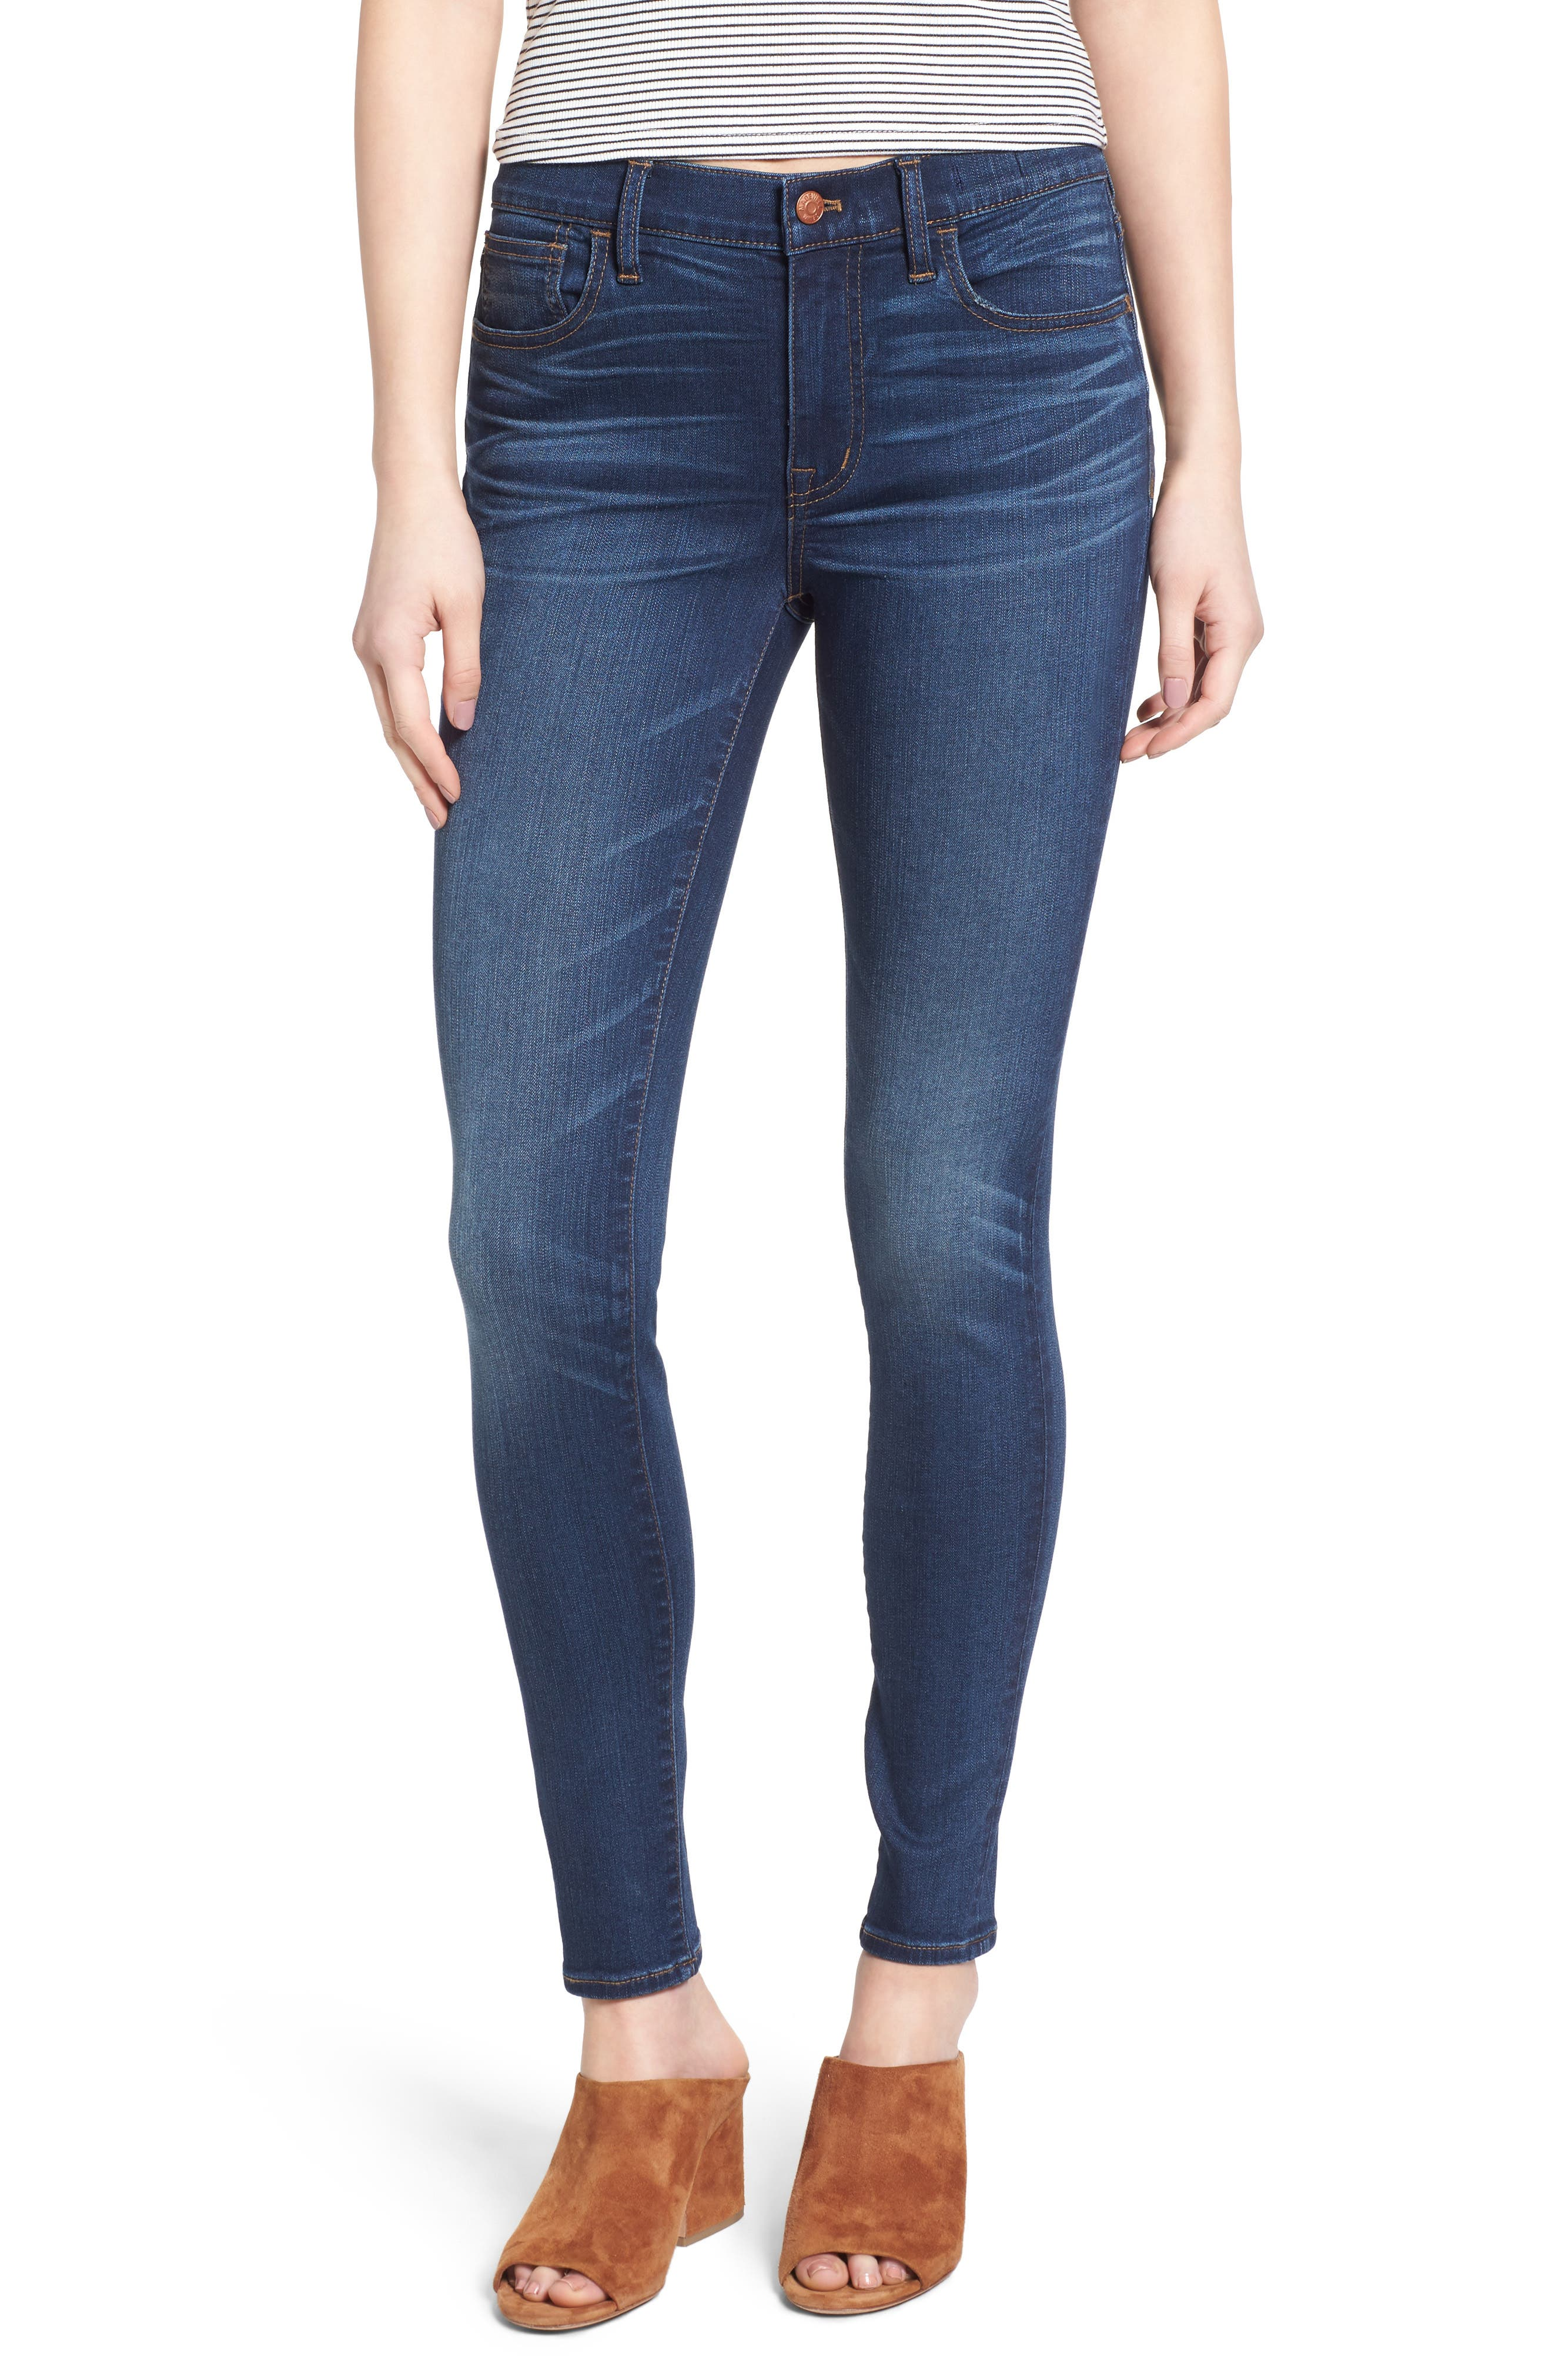 Madewell Roadtripper Jeans (Darryl Wash)